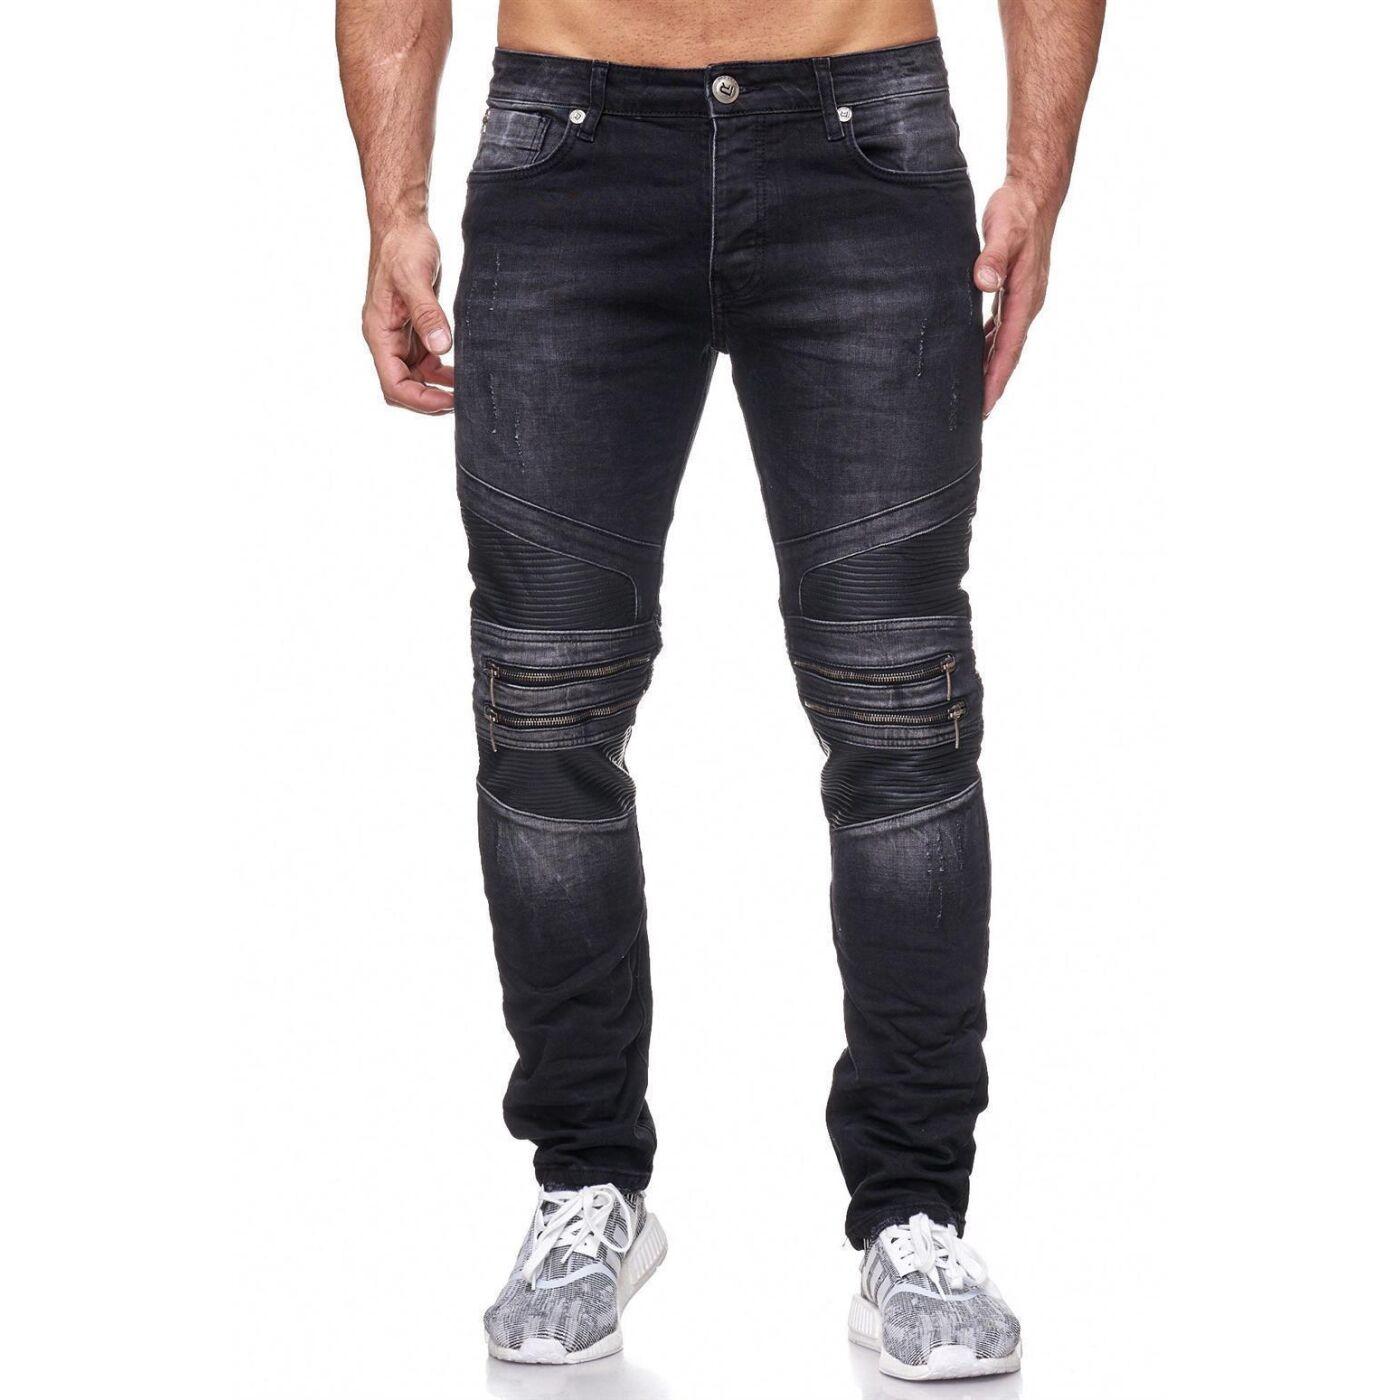 red bridge herren jeans hose mc motorrad biker black style. Black Bedroom Furniture Sets. Home Design Ideas